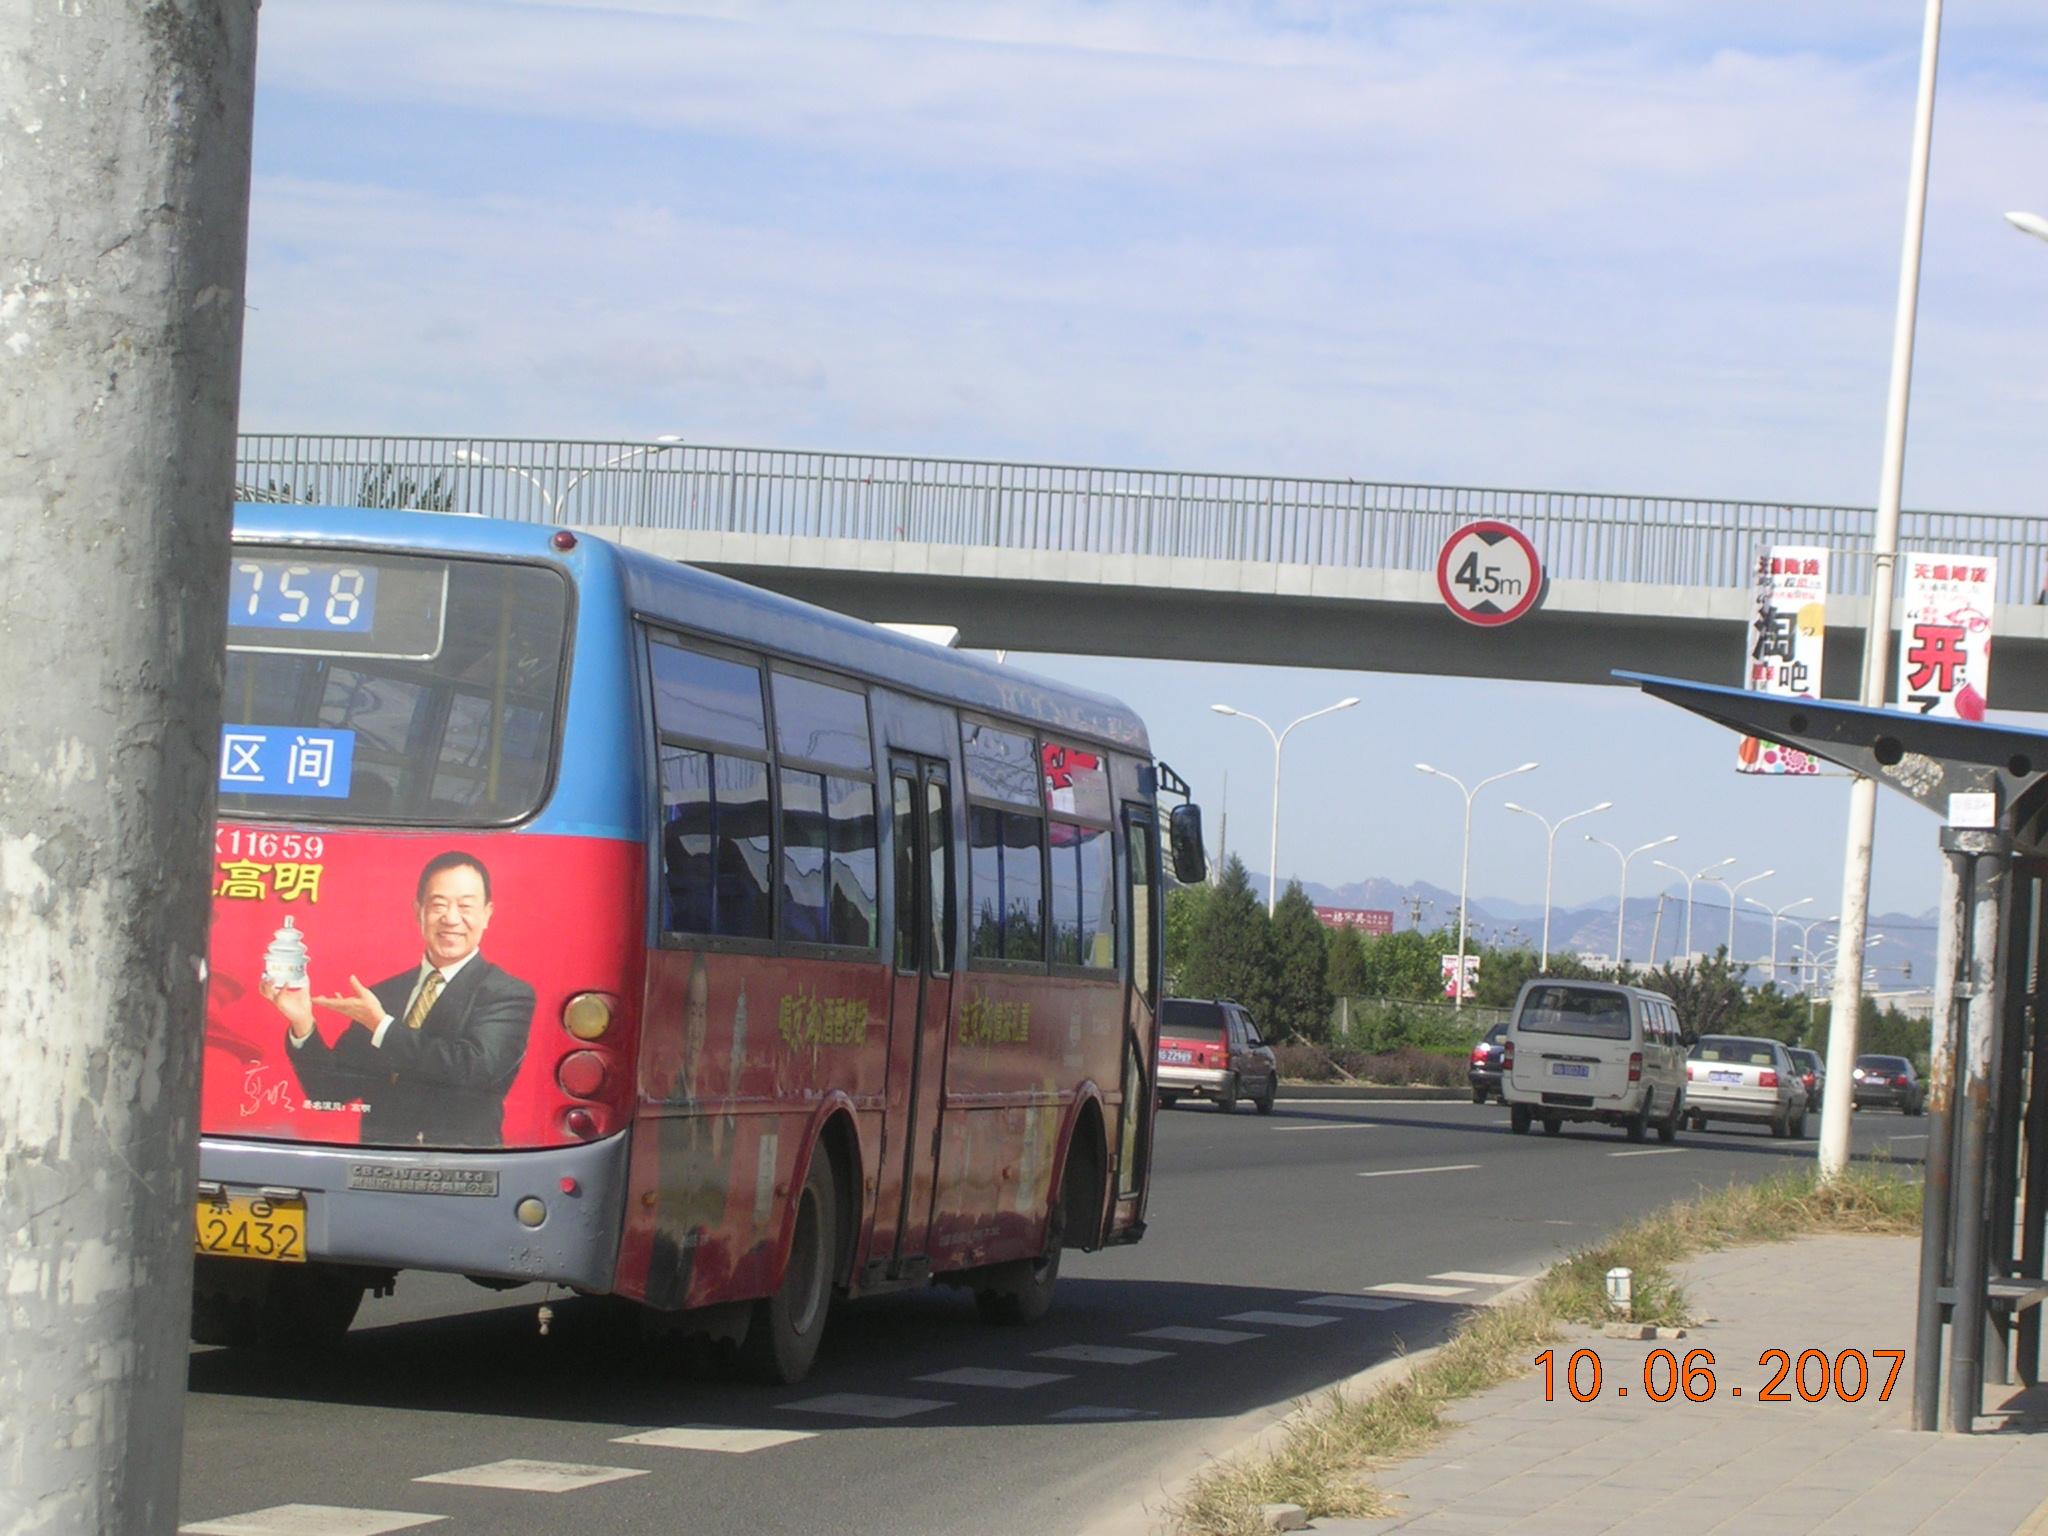 2007-10-07A 011.jpg